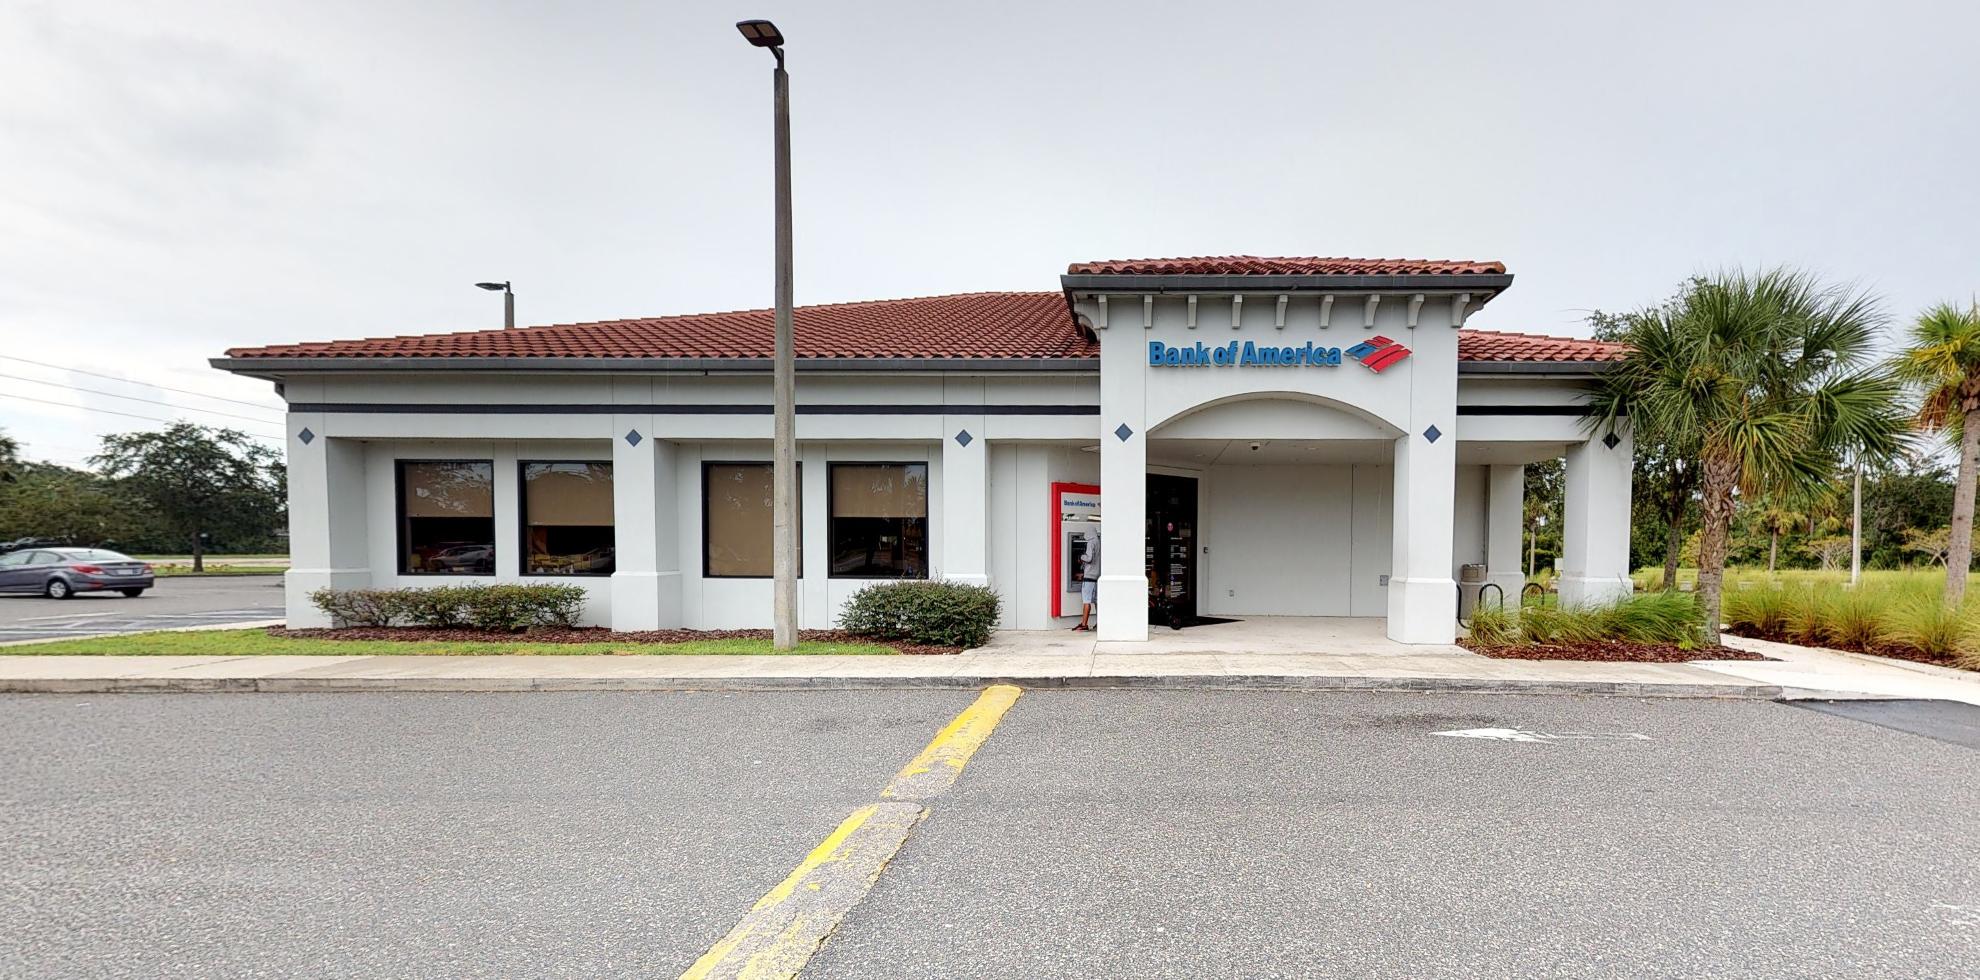 Bank of America financial center with drive-thru ATM and teller | 700 S Alafaya Trl, Orlando, FL 32828